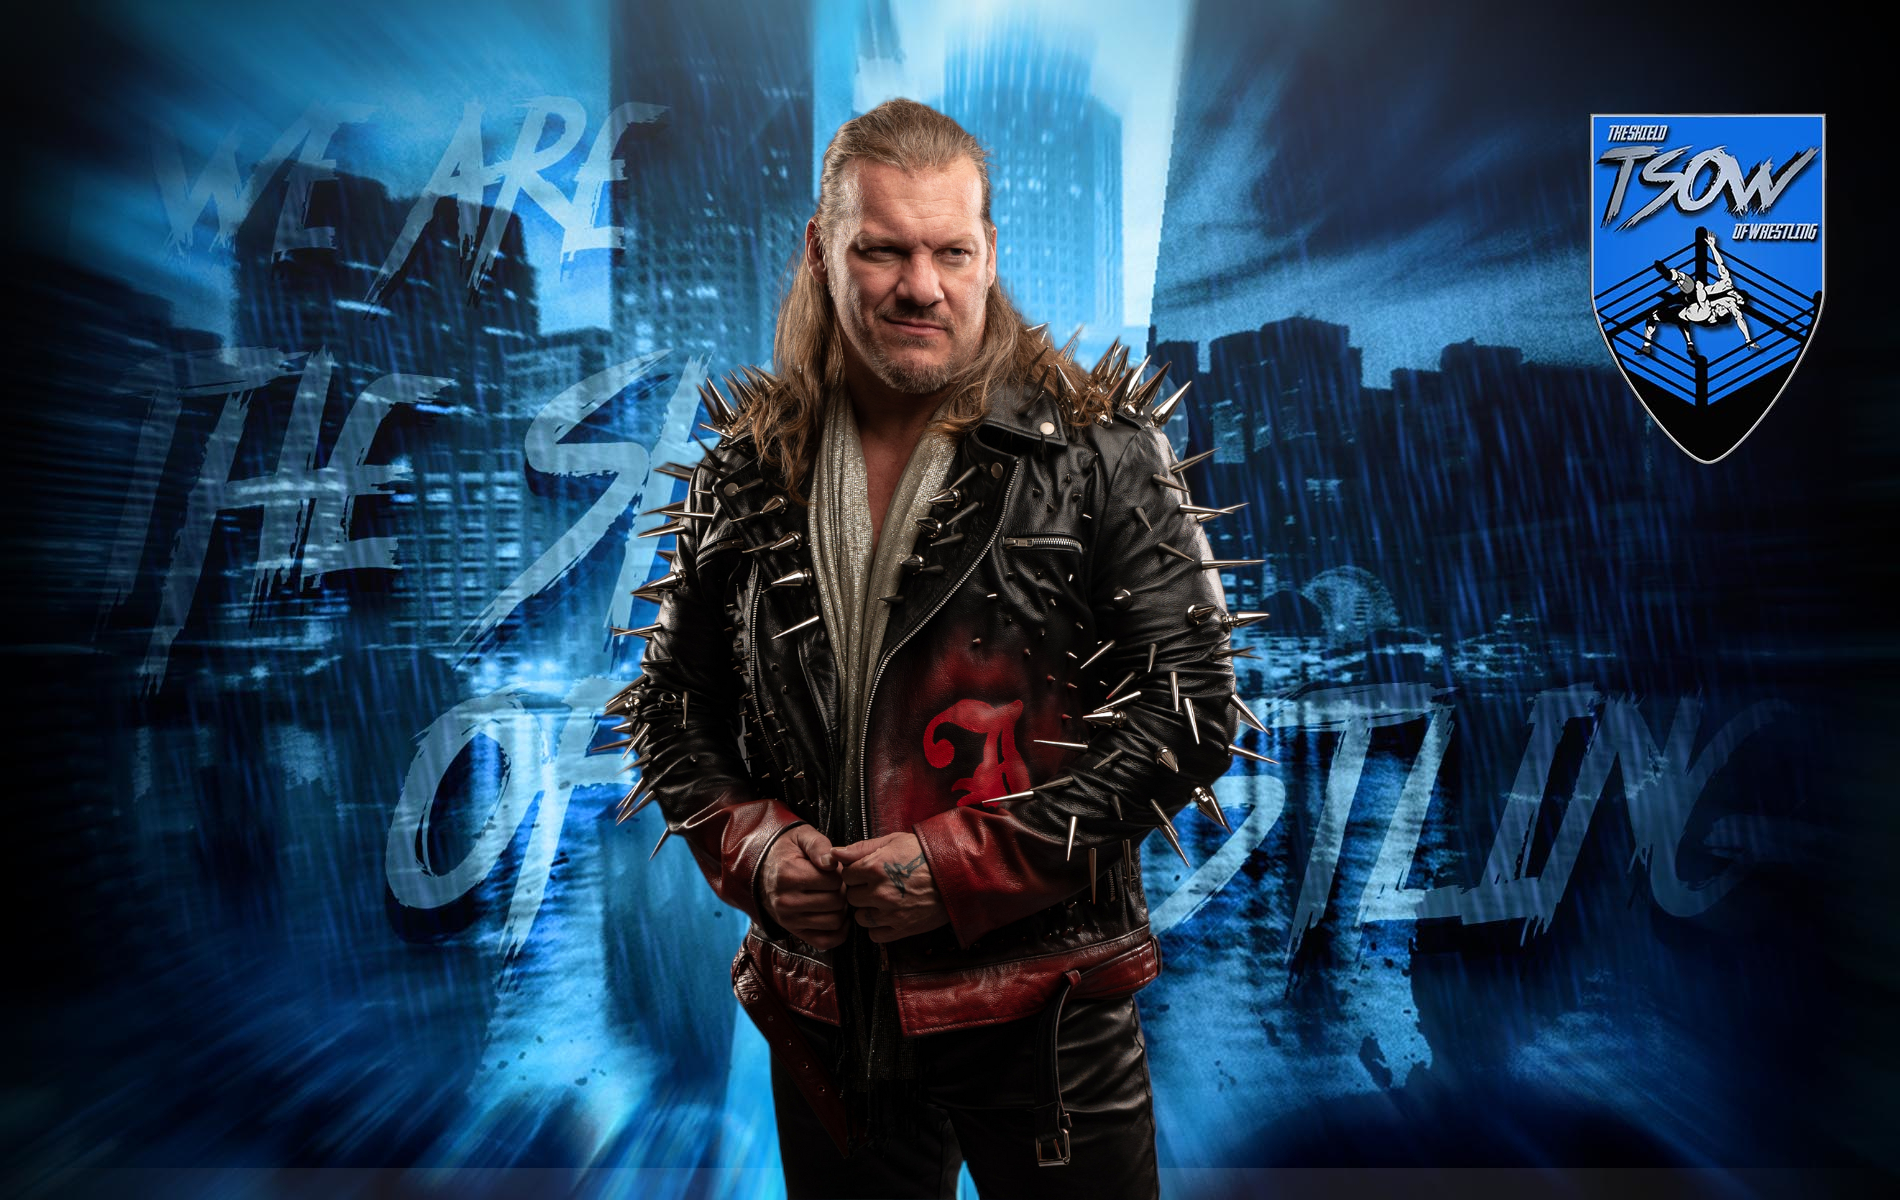 Chris Jericho: i suoi auguri a The Undertaker per i trenta anni in WWE